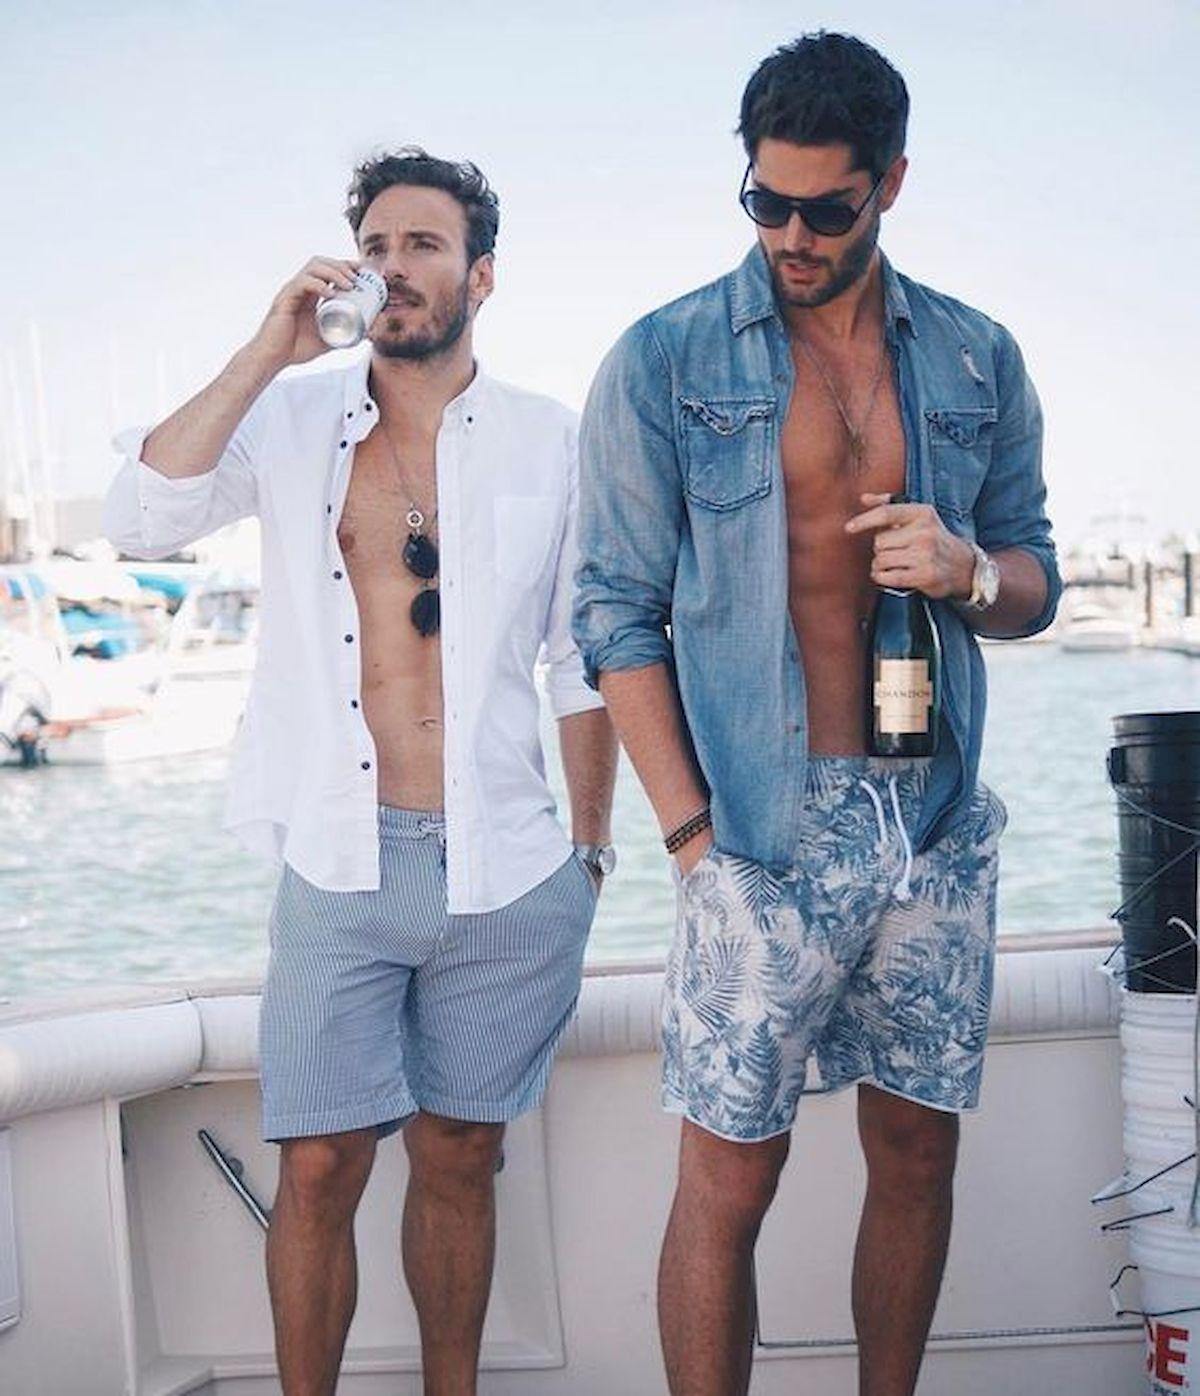 Iconic Menswear Business Good Income